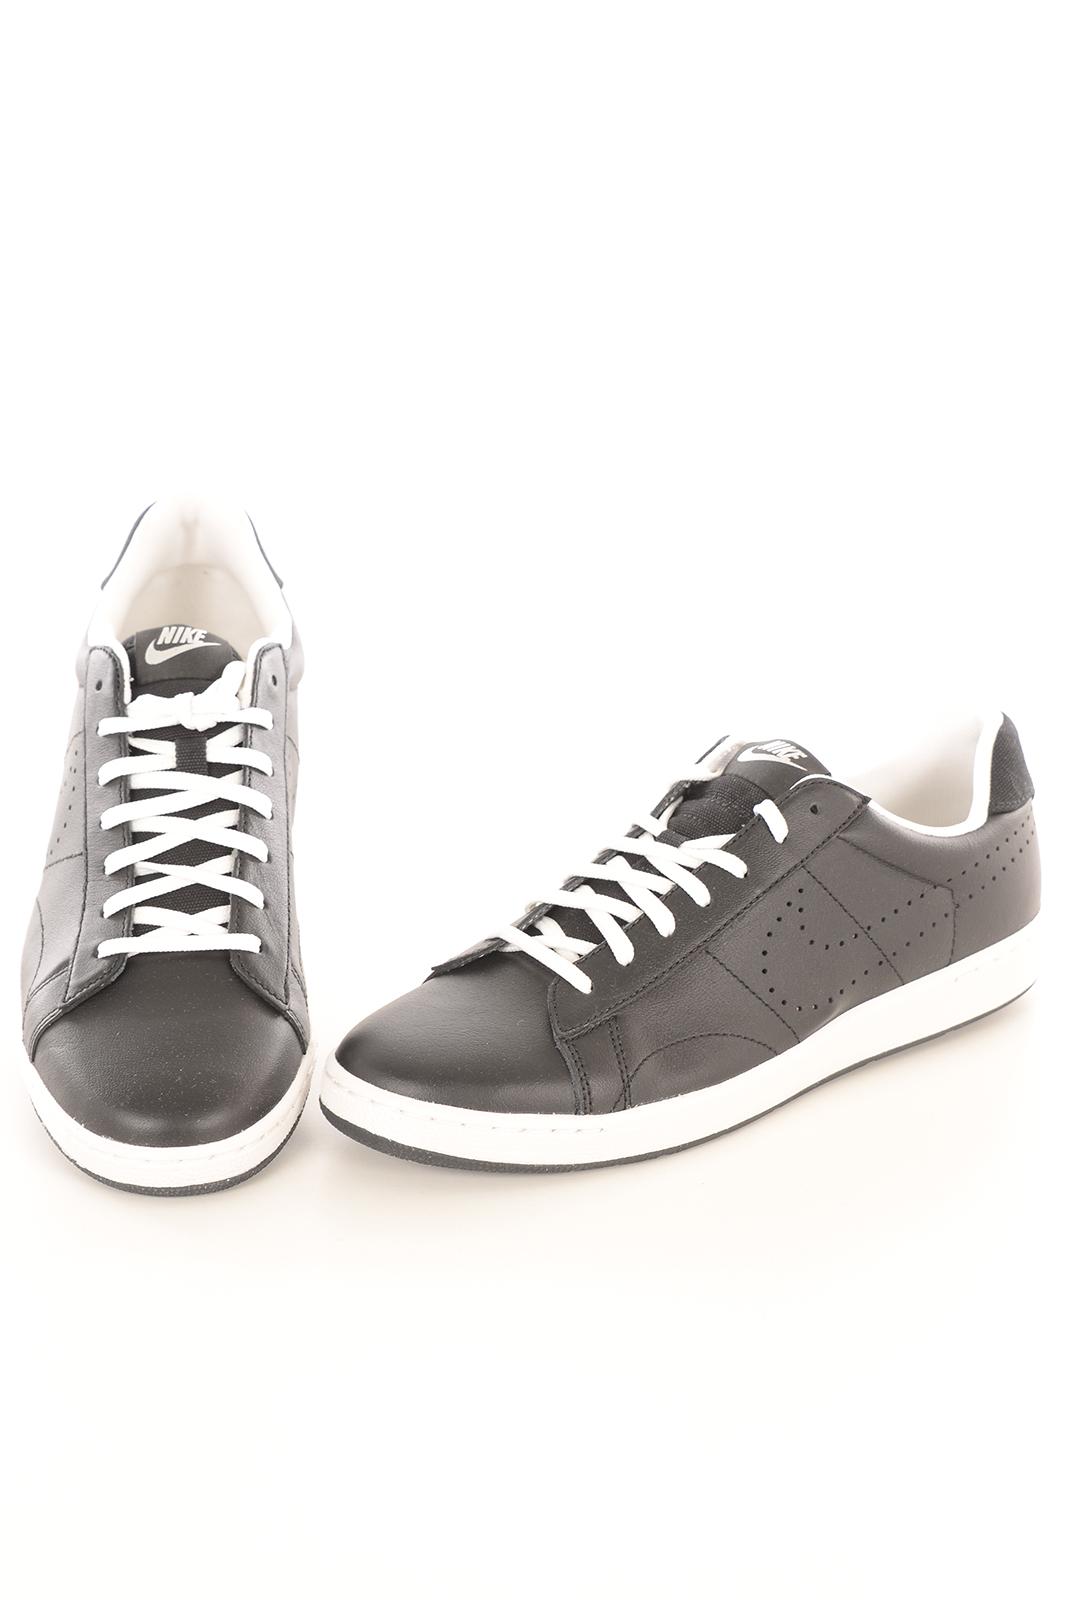 Chaussures   Nike 749644 TENNIS CLASSIC 001 NOIR